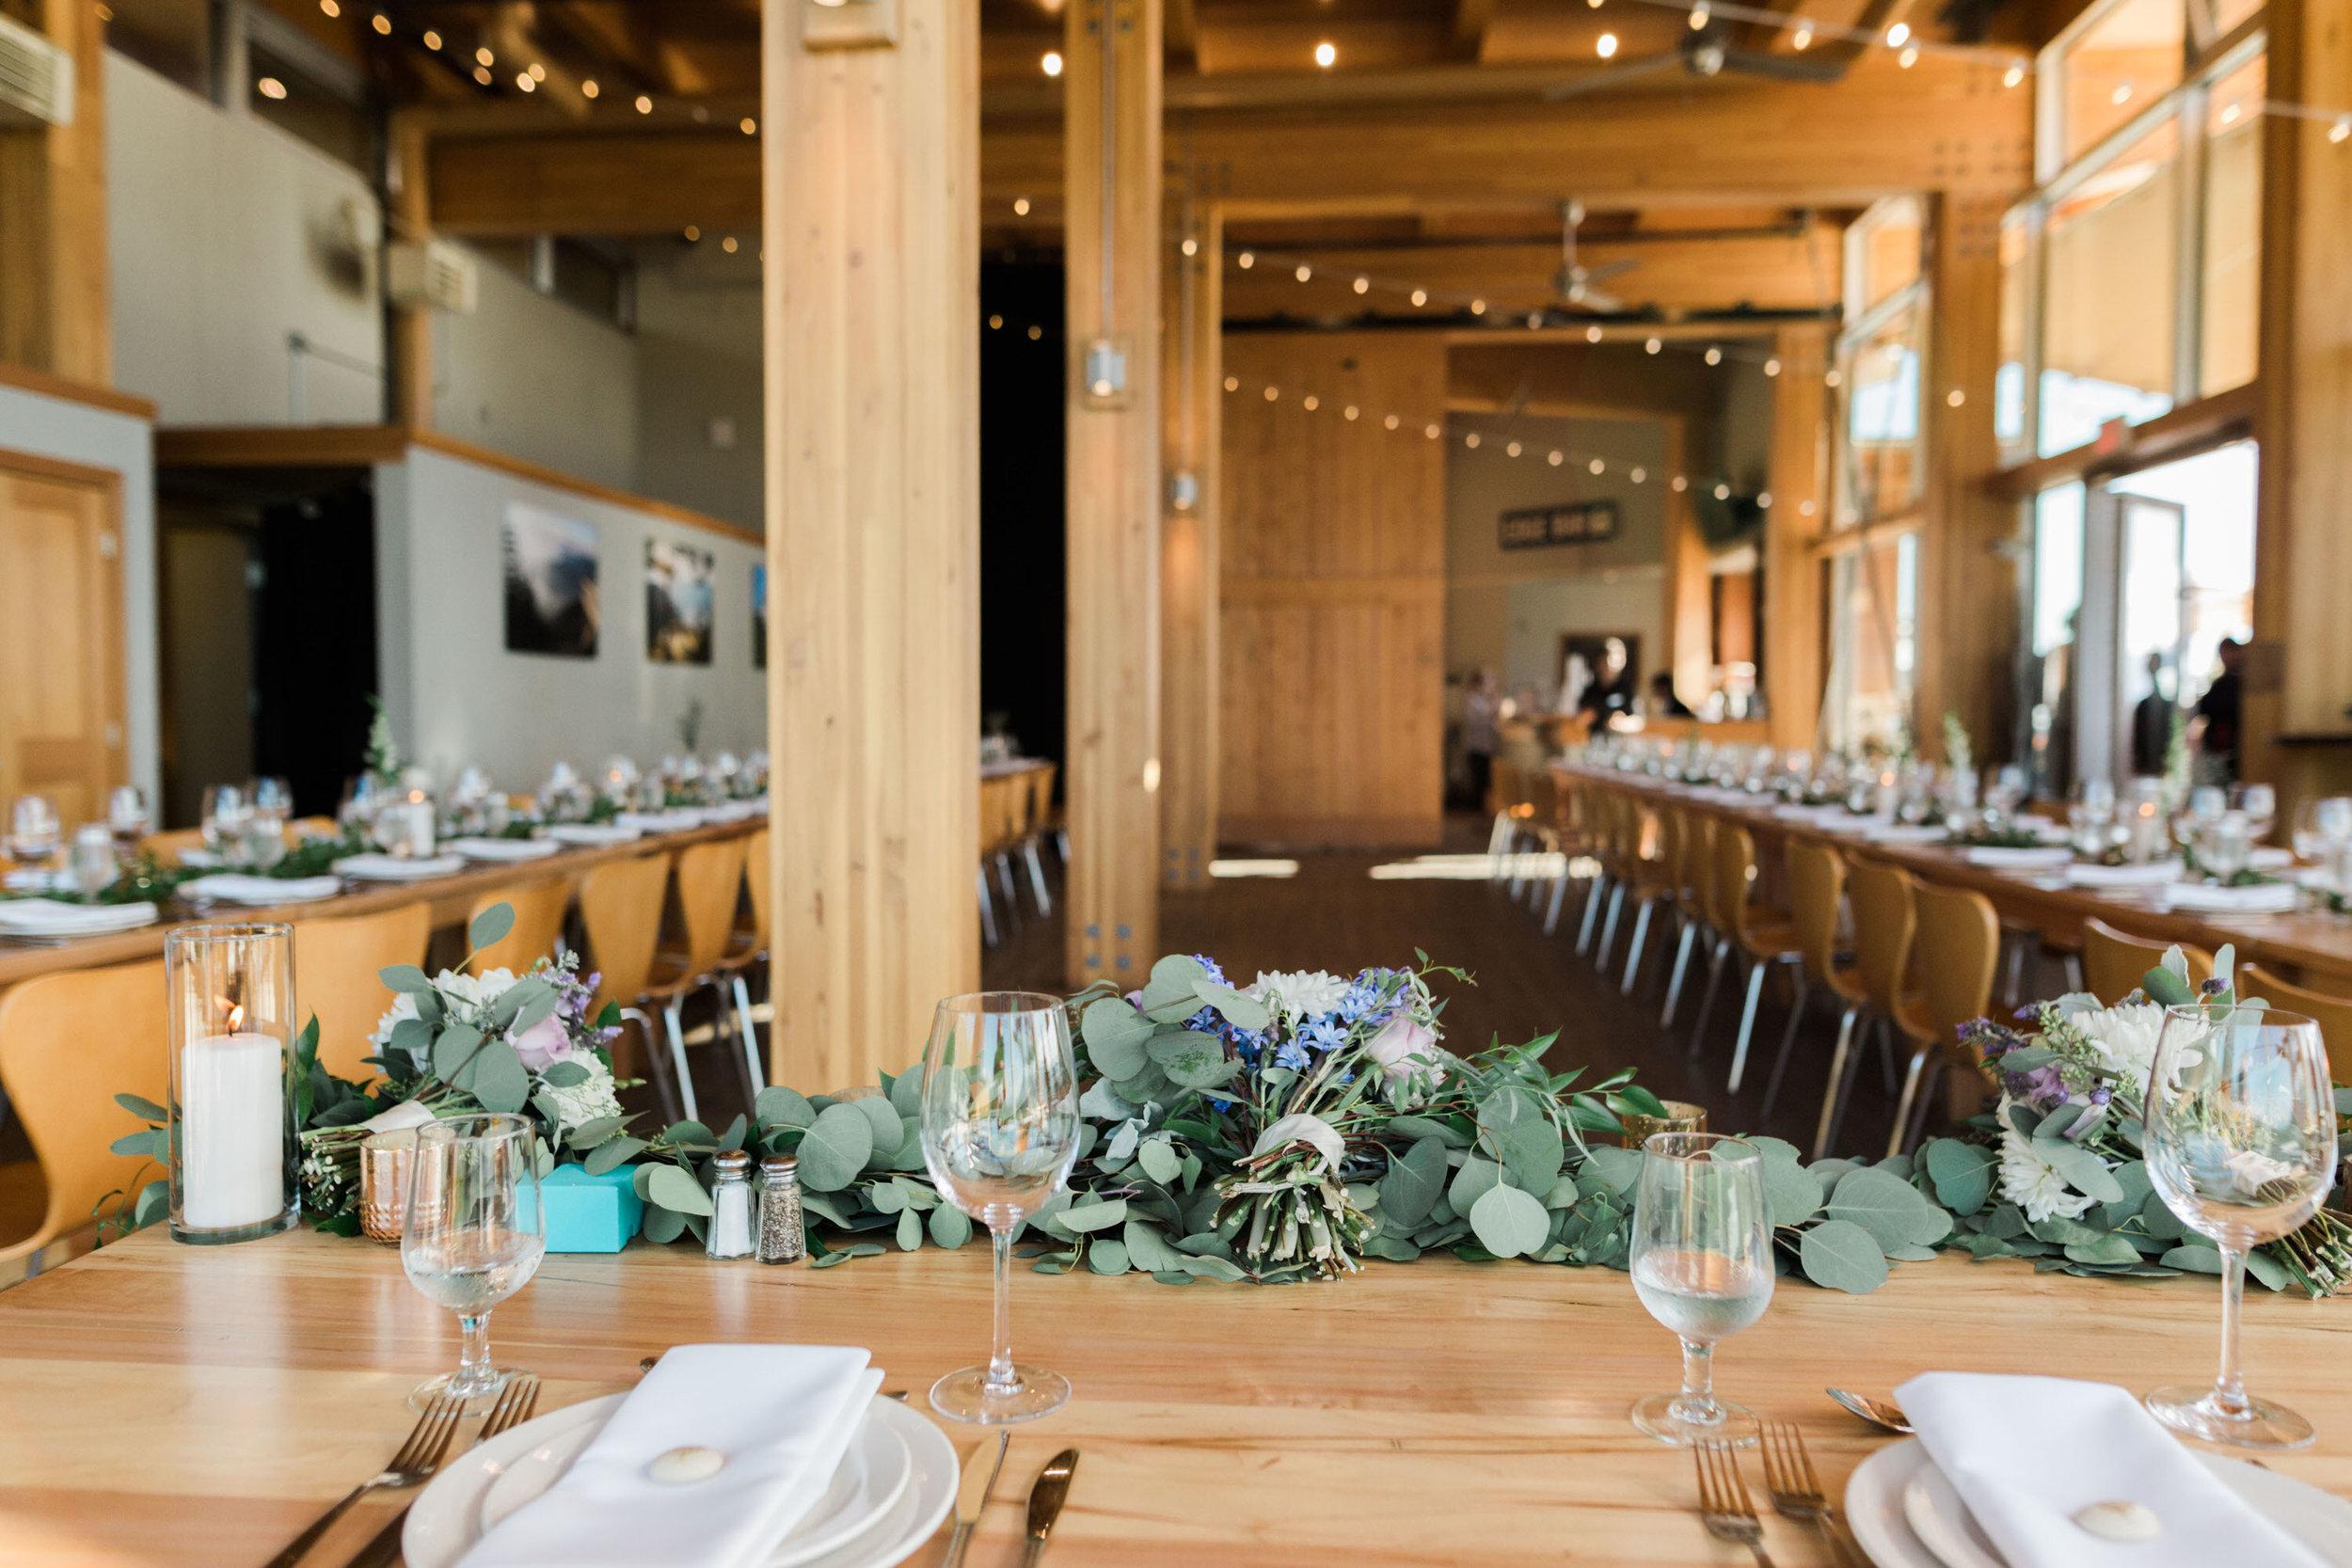 Squamish Wedding Photographer - Sea to Sky Gondola Wedding Photos -  Vancouver Wedding Photographer & Videographer - Sunshine Coast Wedding Photos - Sunshine Coast Wedding Photographer - Jennifer Picard Photography - IMG_4090.jpg